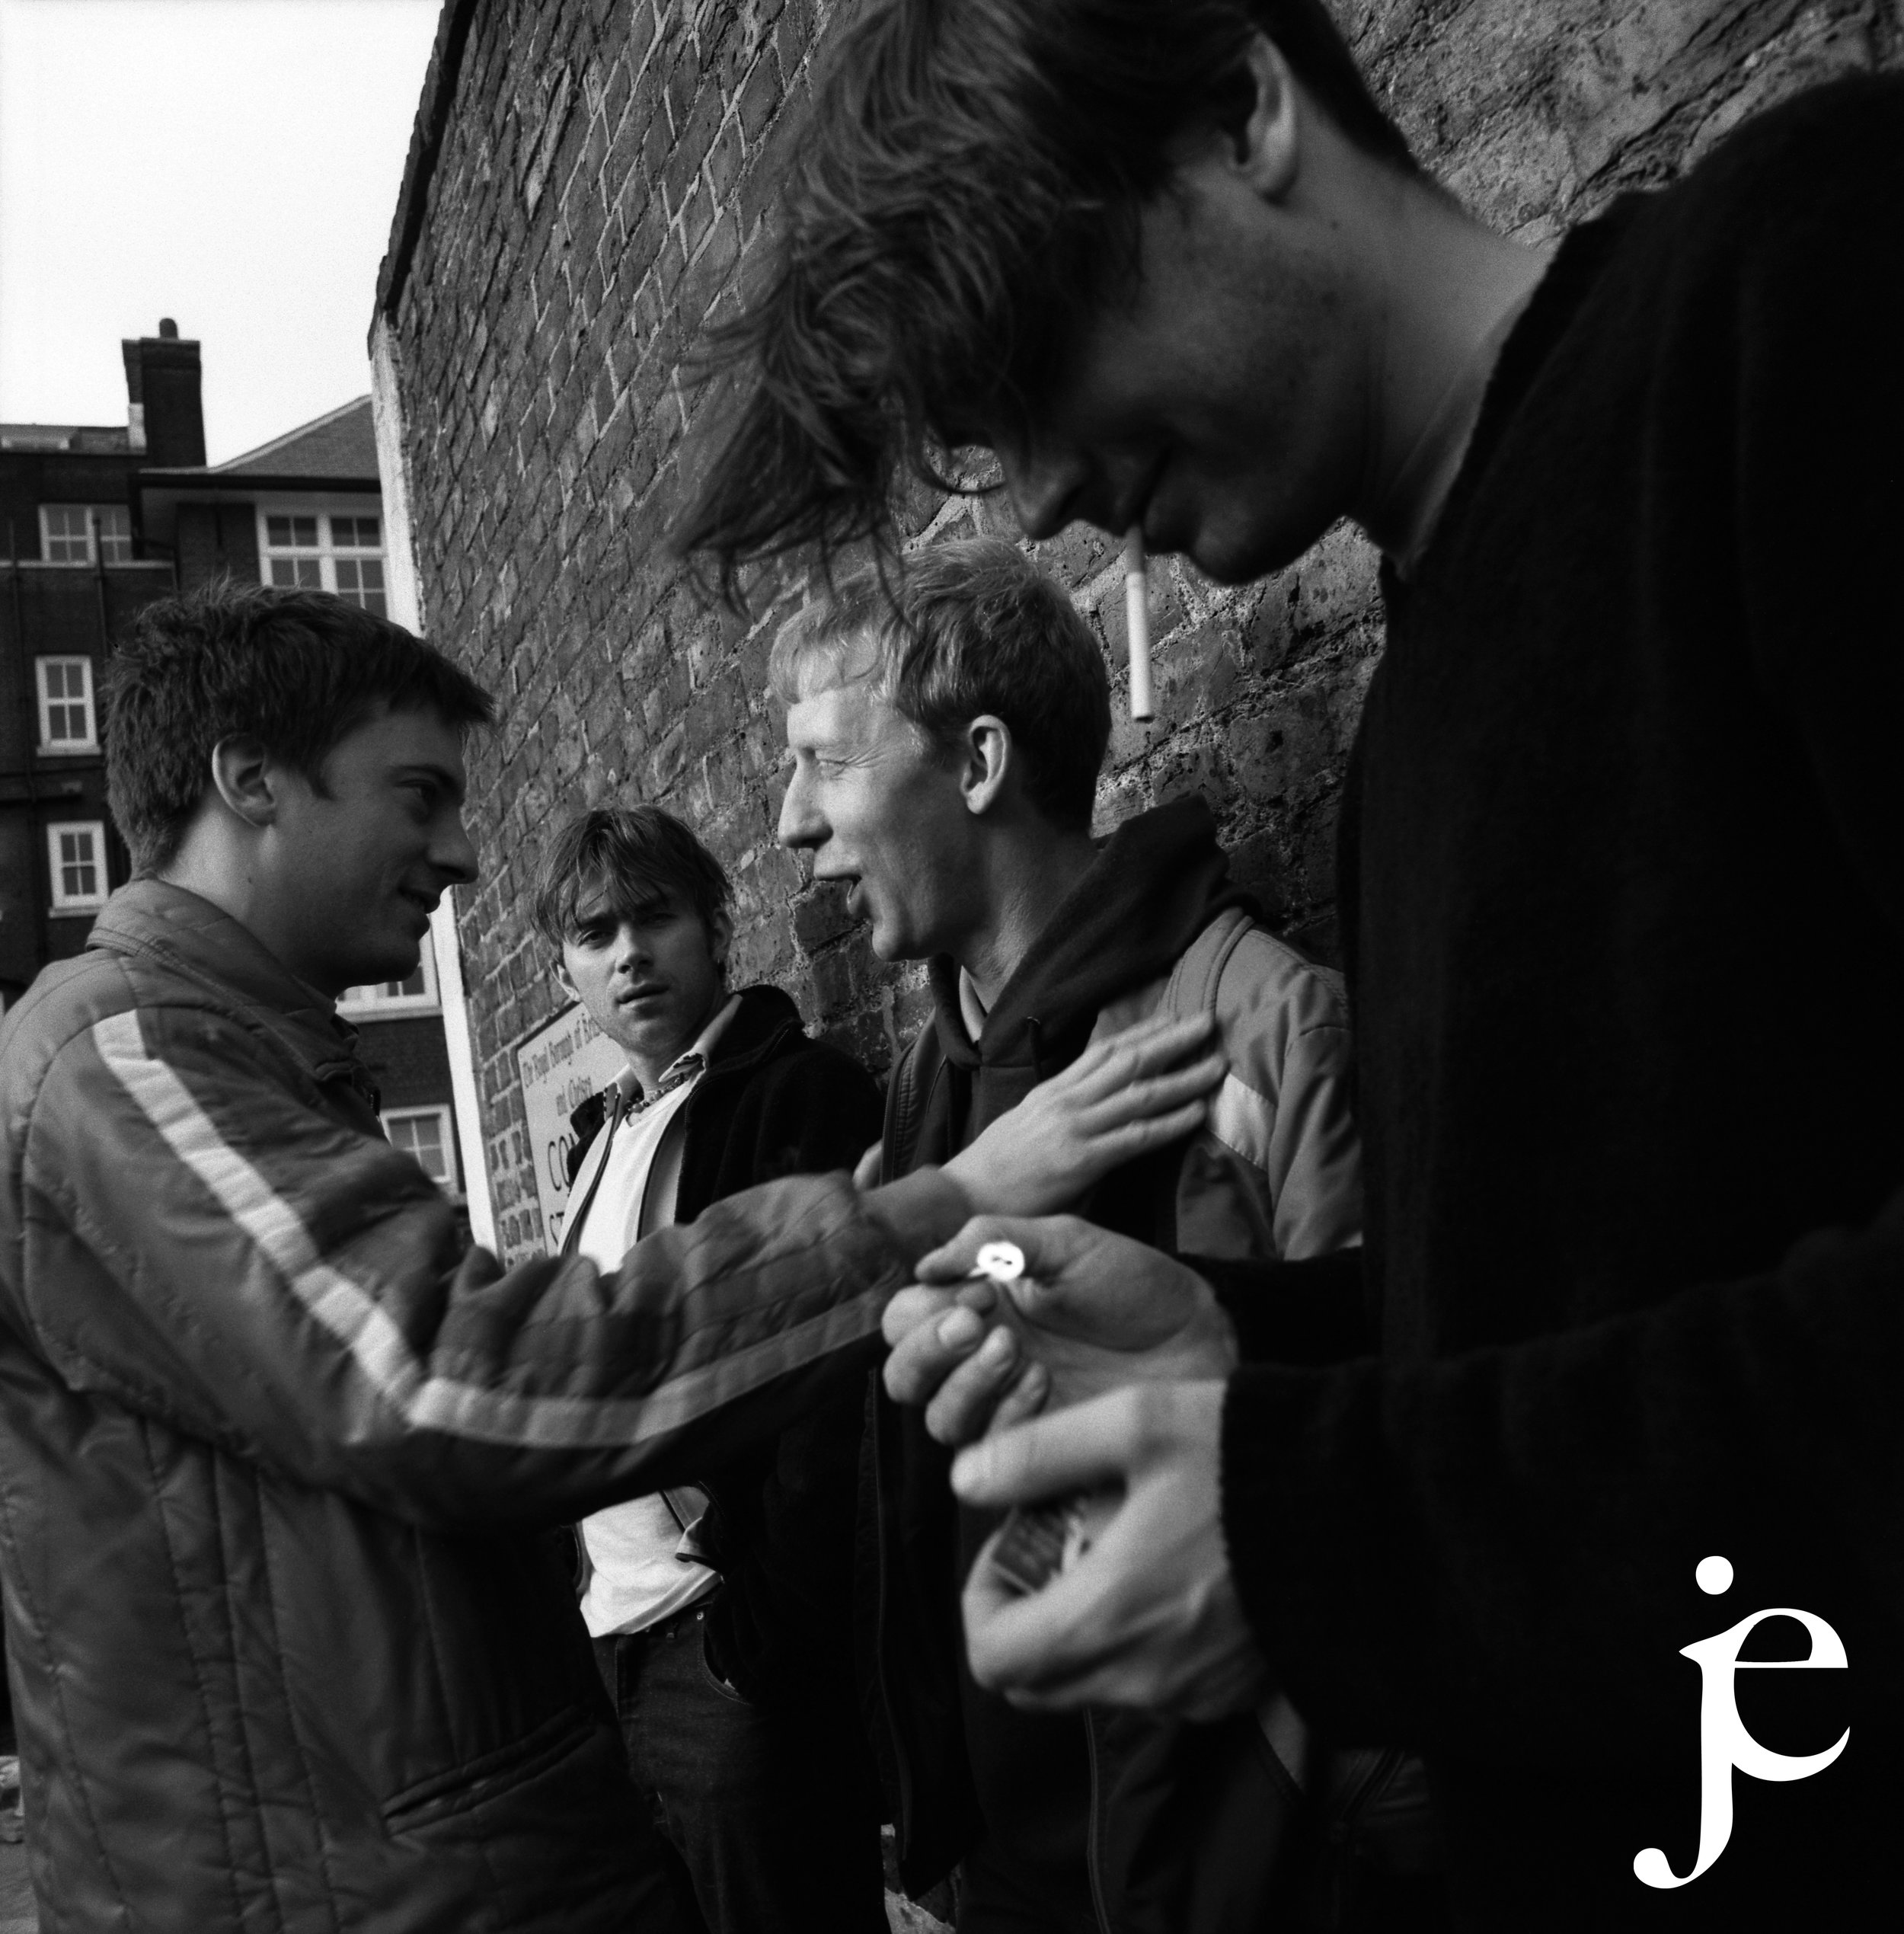 Blur, Ladbroke Grove, NW London, 1999